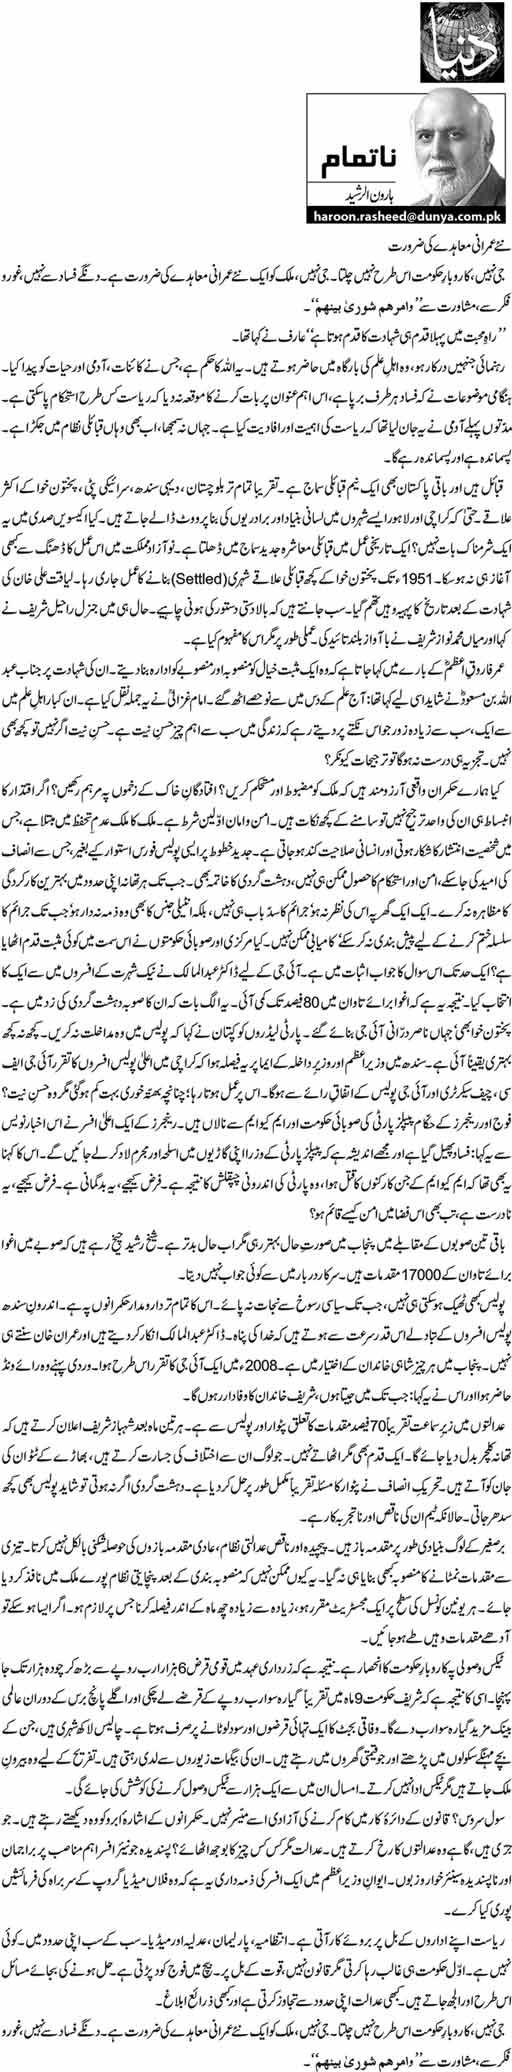 Naye Imrani Moahiday Ki Zarorat - Haroon ur Rasheed